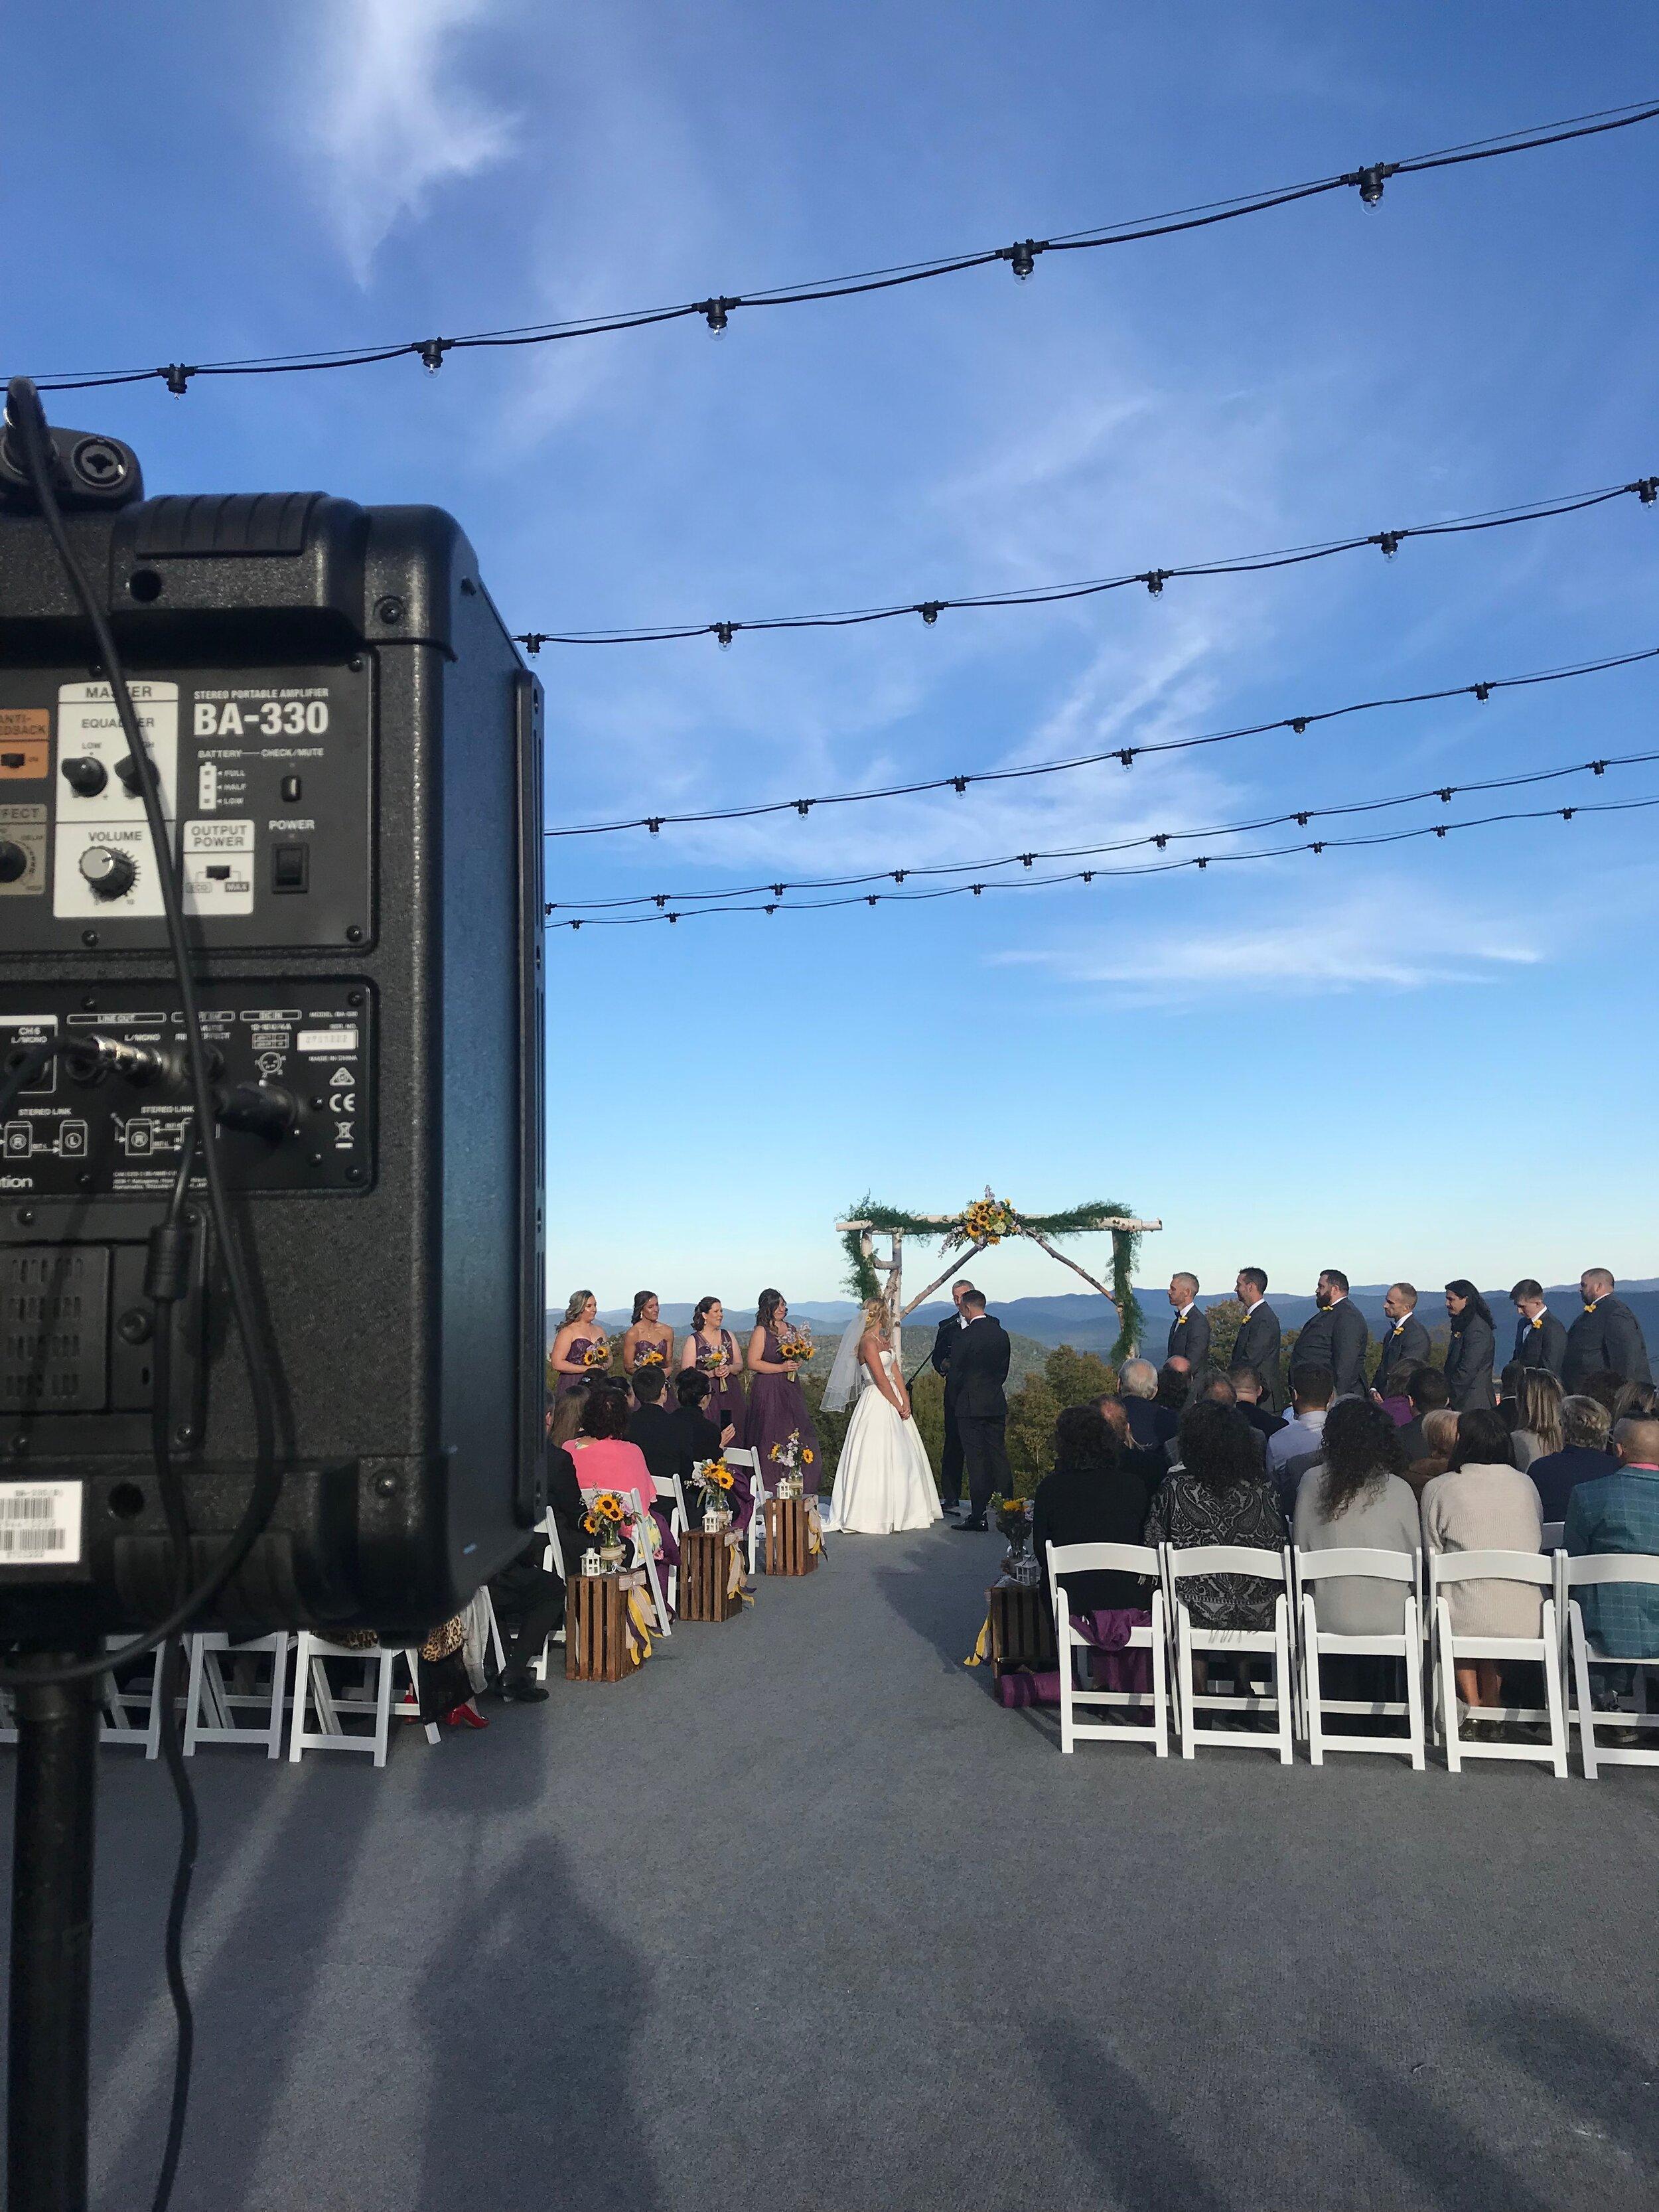 Isaiah Bennett Wedding Music